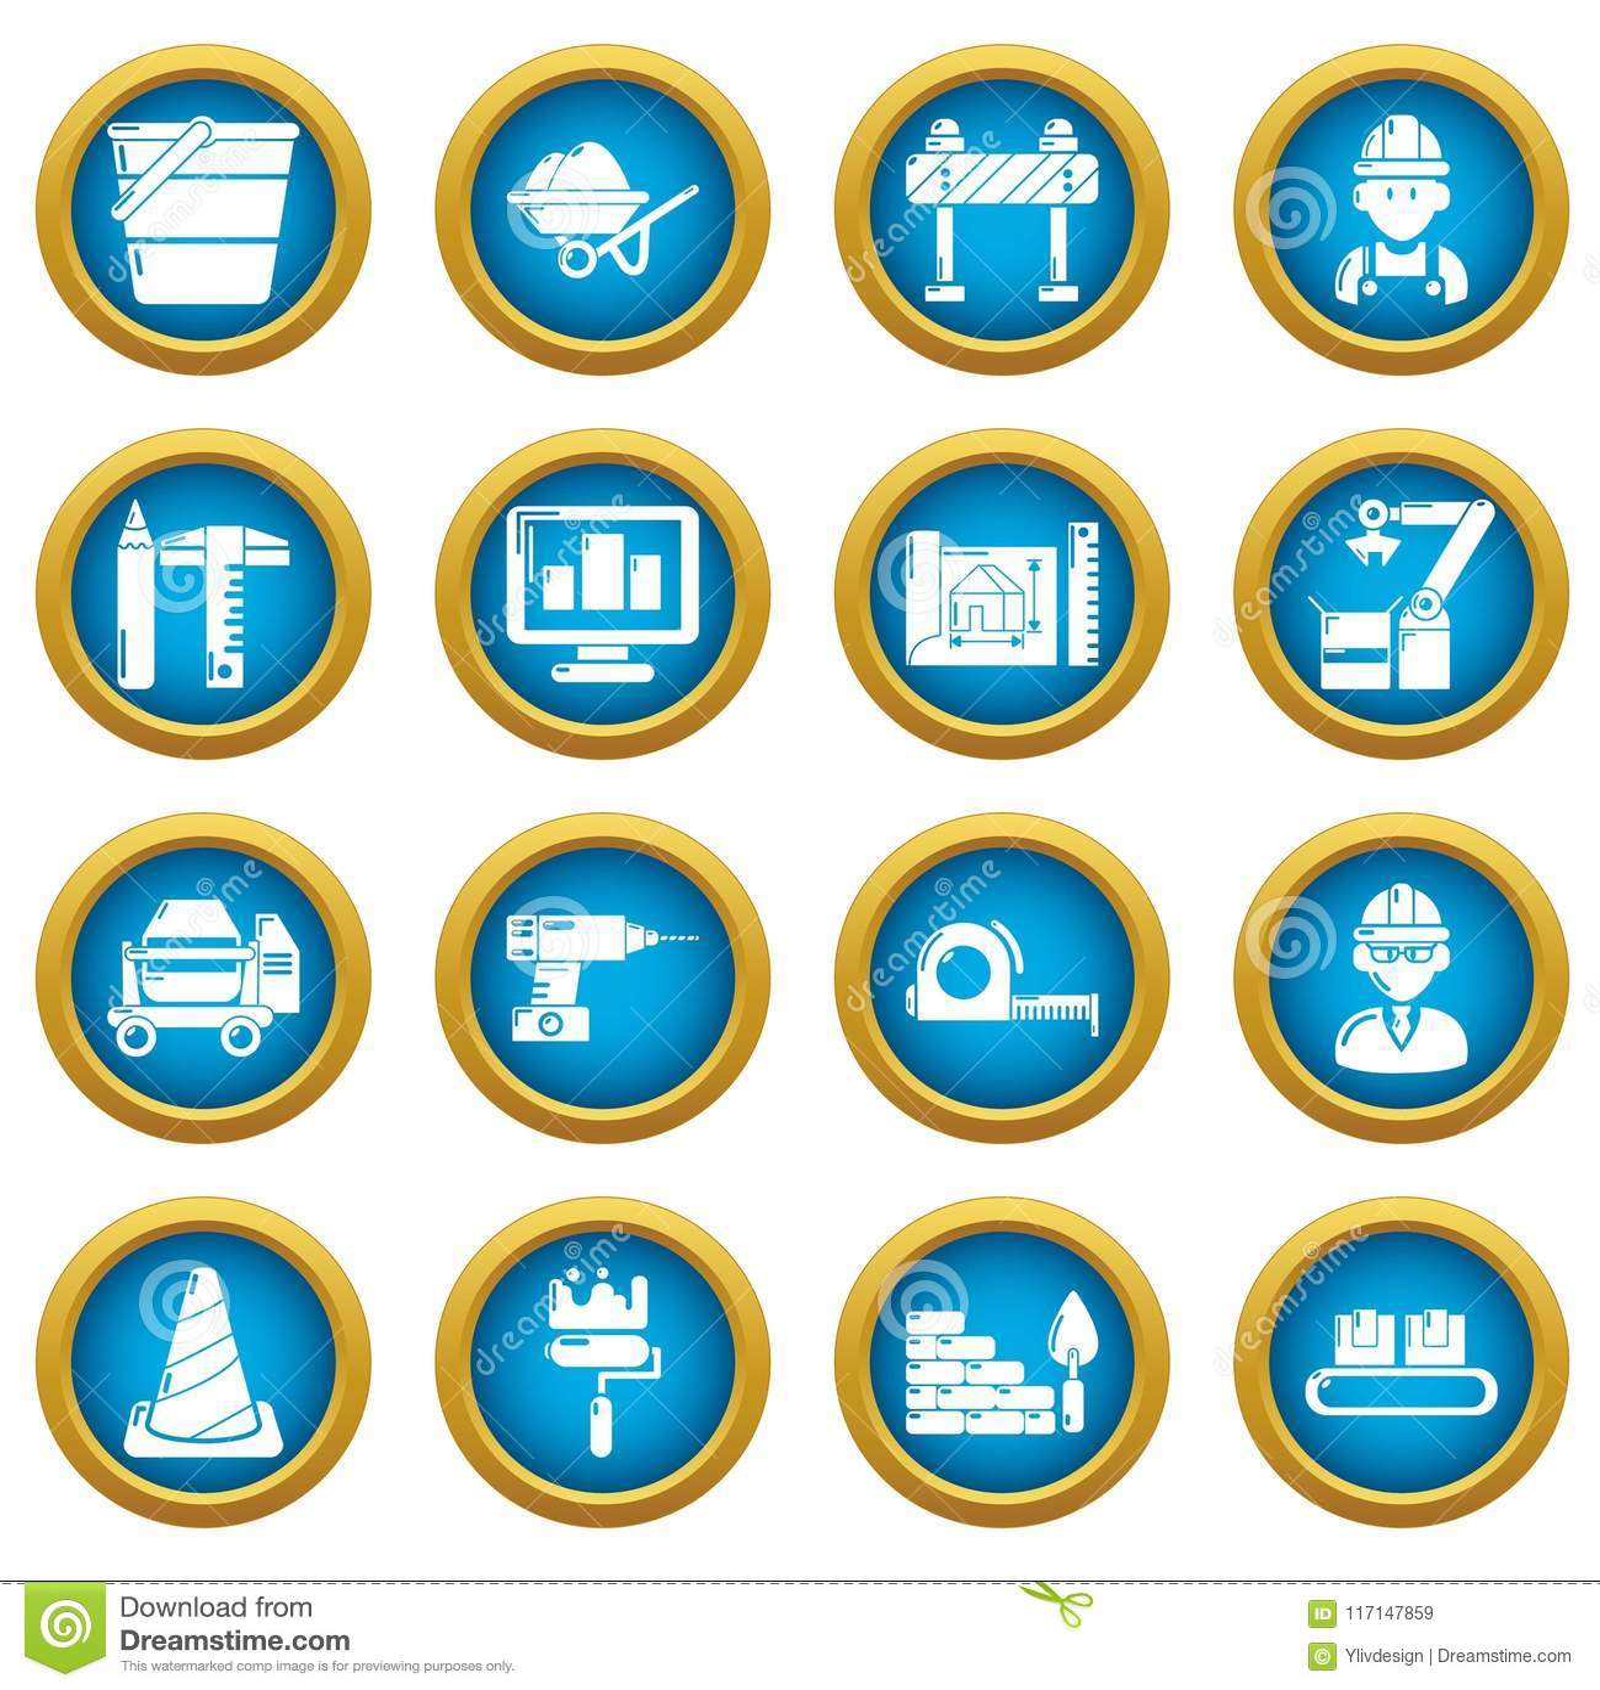 building process icons set